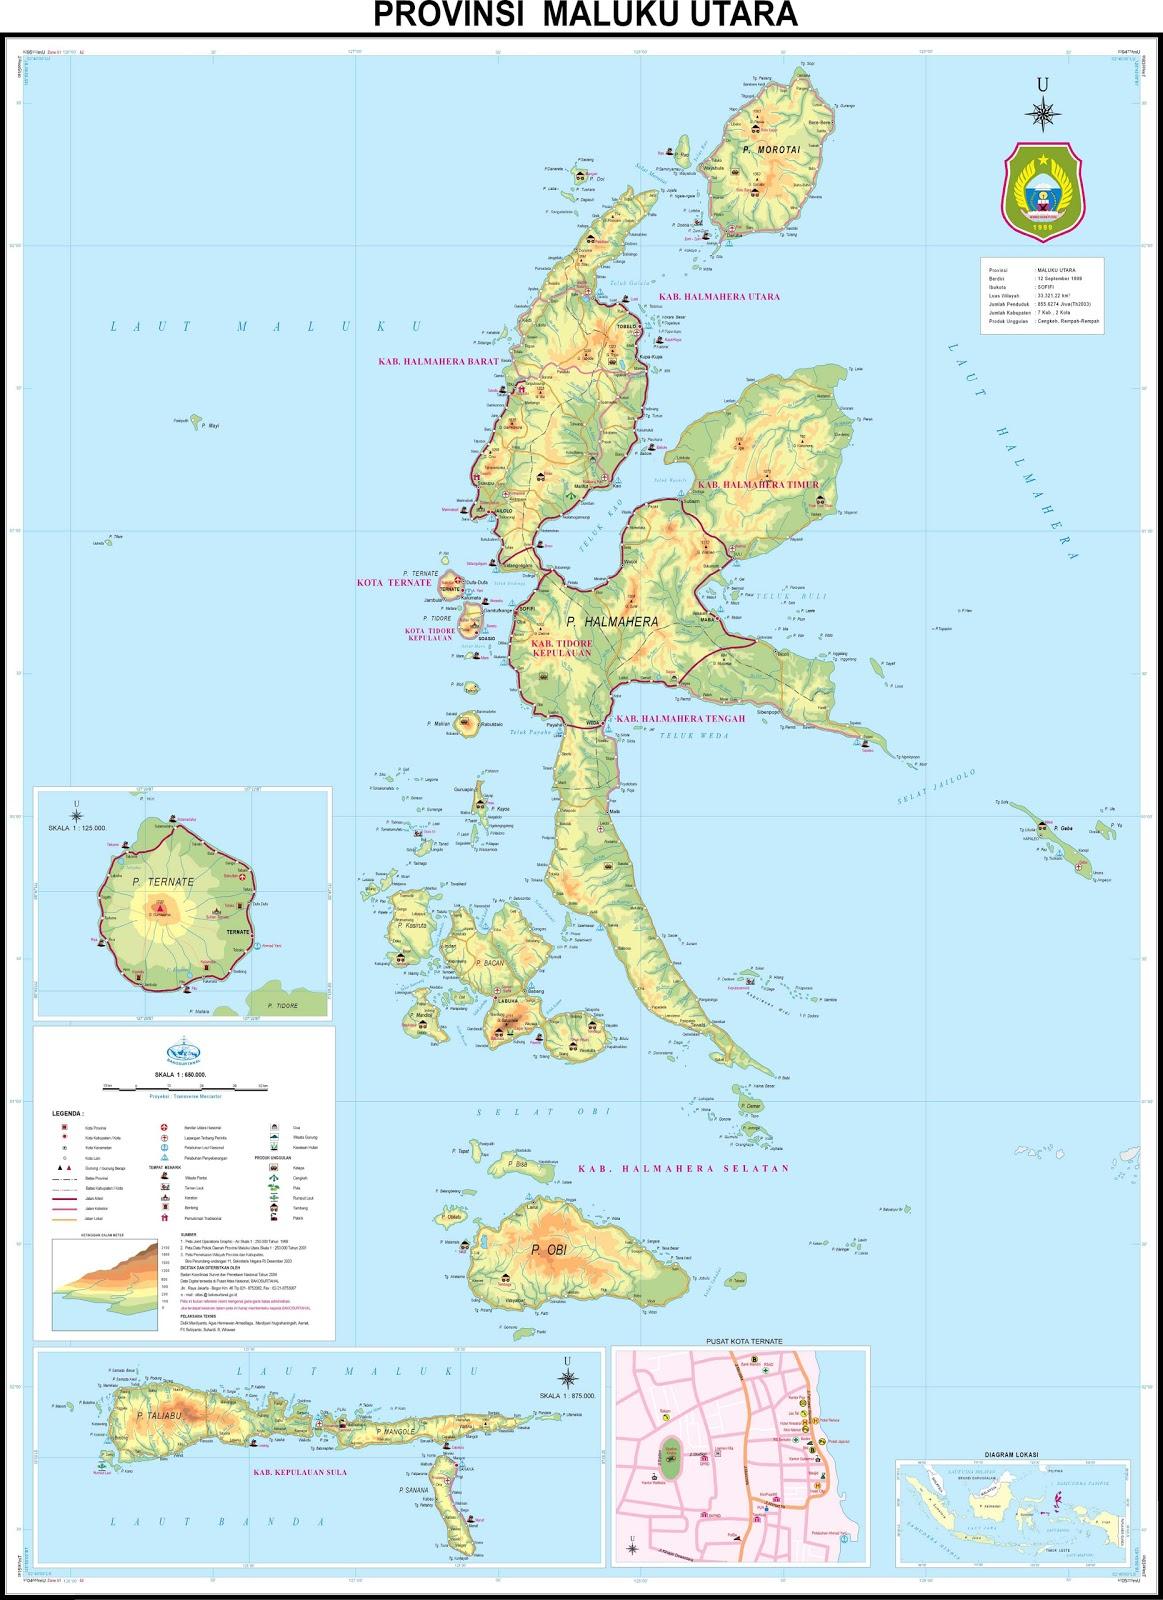 Peta Provinsi Maluku Utara (Malut)